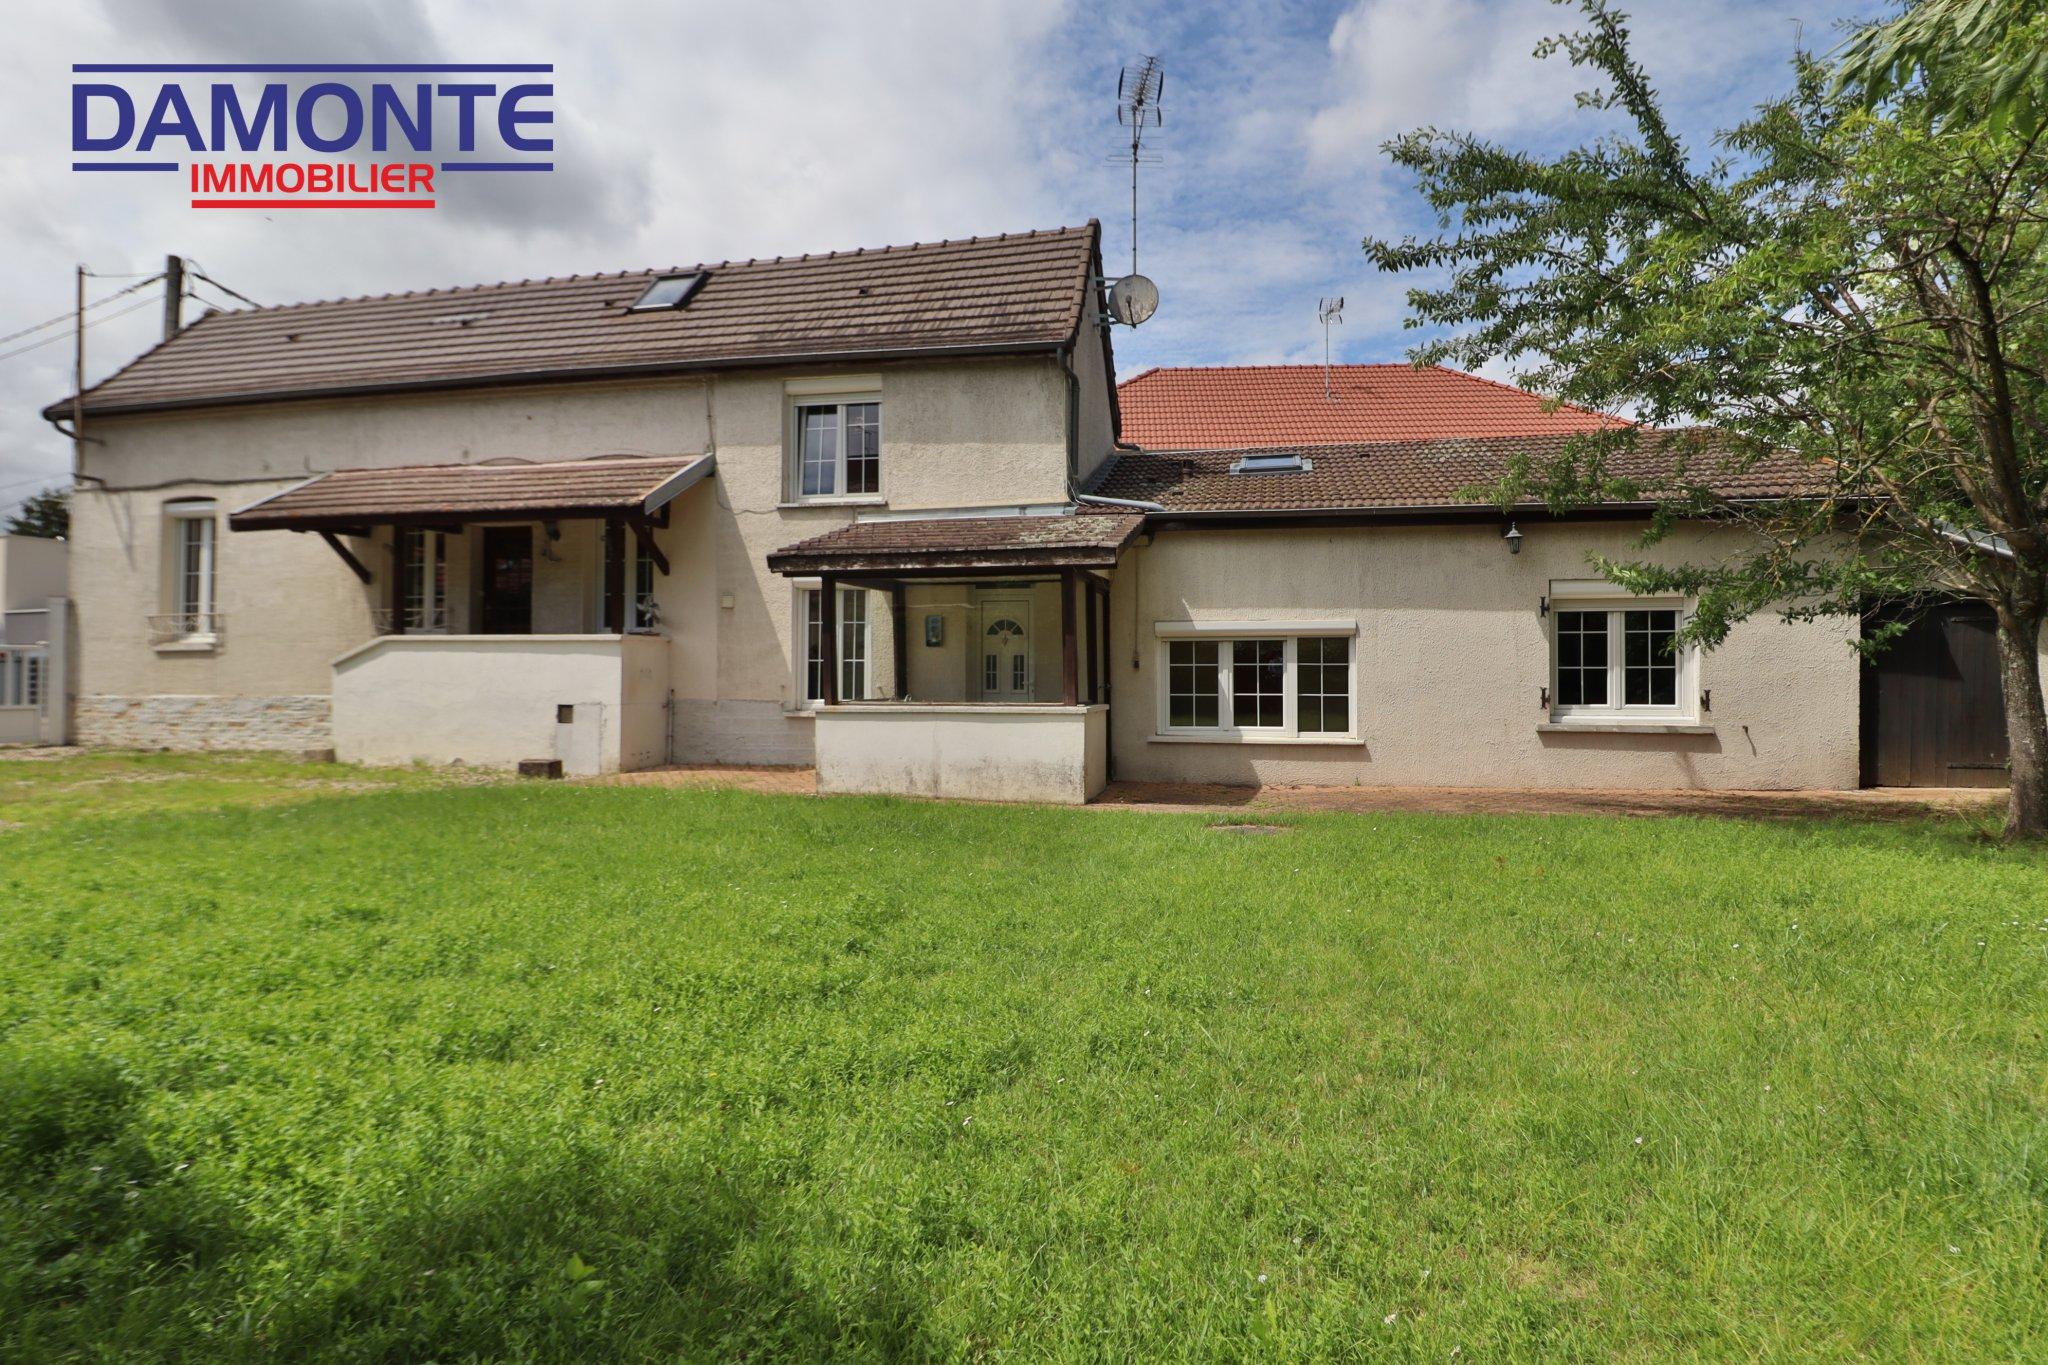 Damonte Achat maison - Réf n° 1_19211